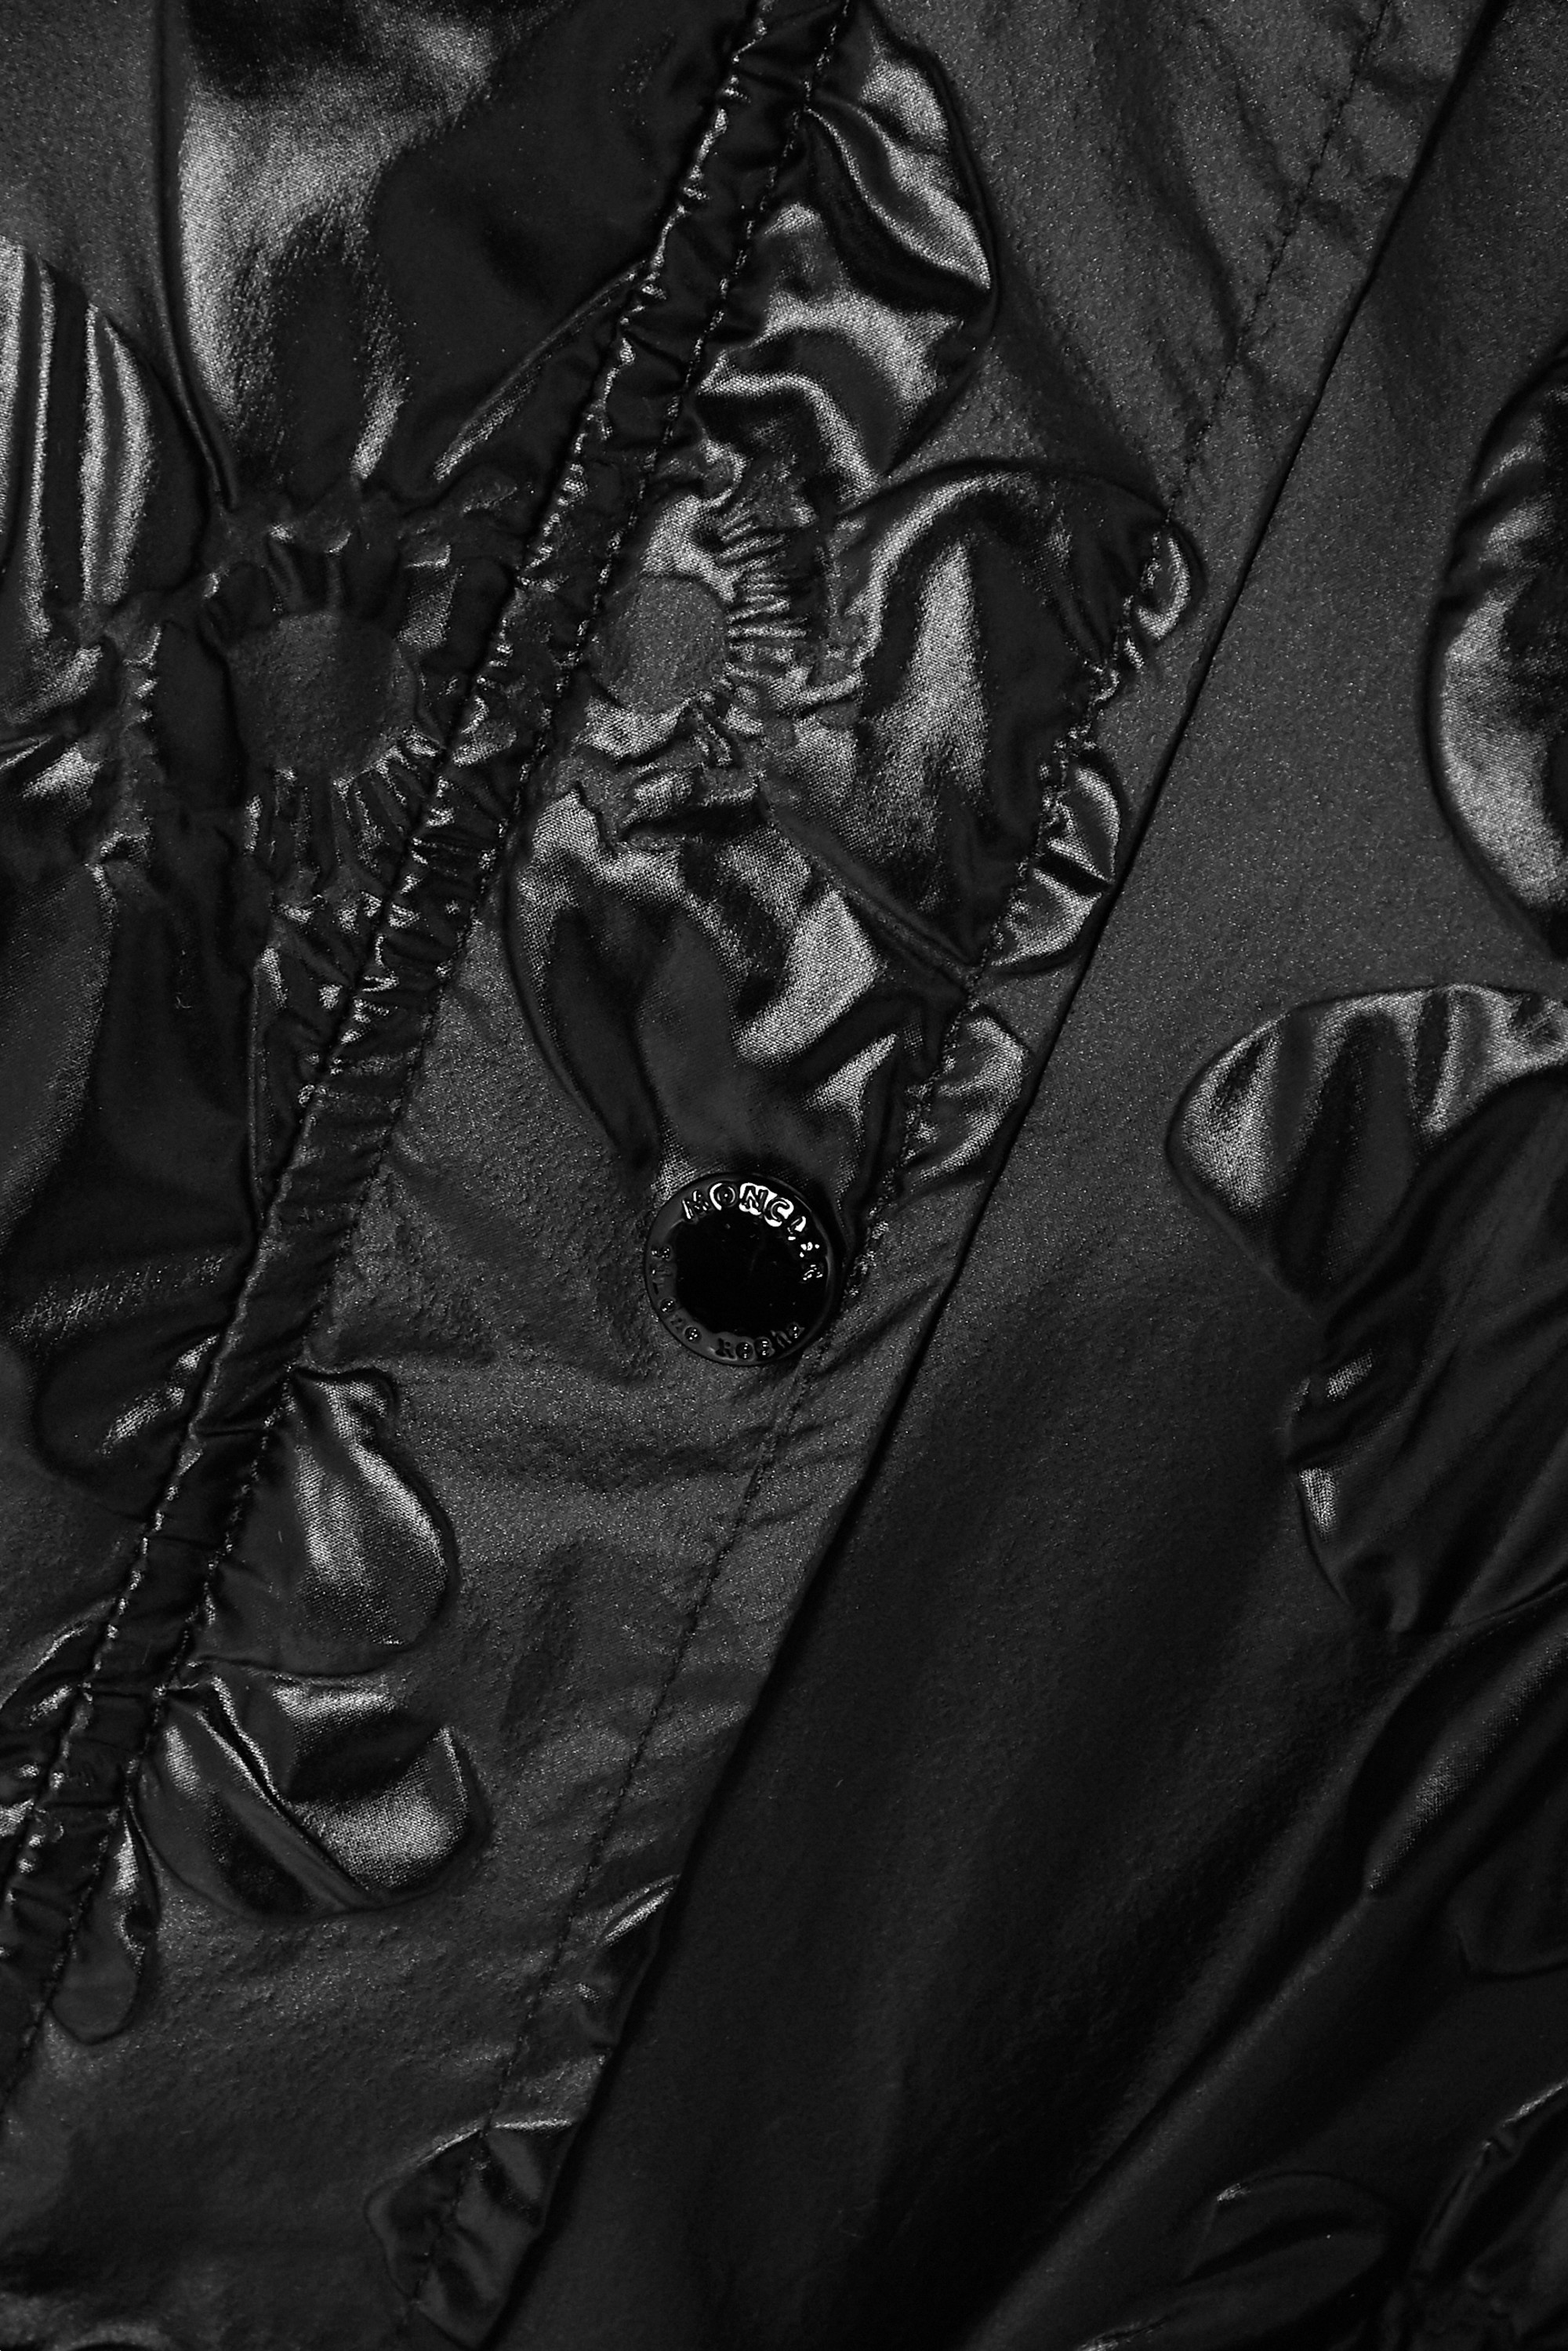 Black + 4 Simone Rocha Rapahelis Belted Floral-jacquard Shell Coat | Moncler Genius